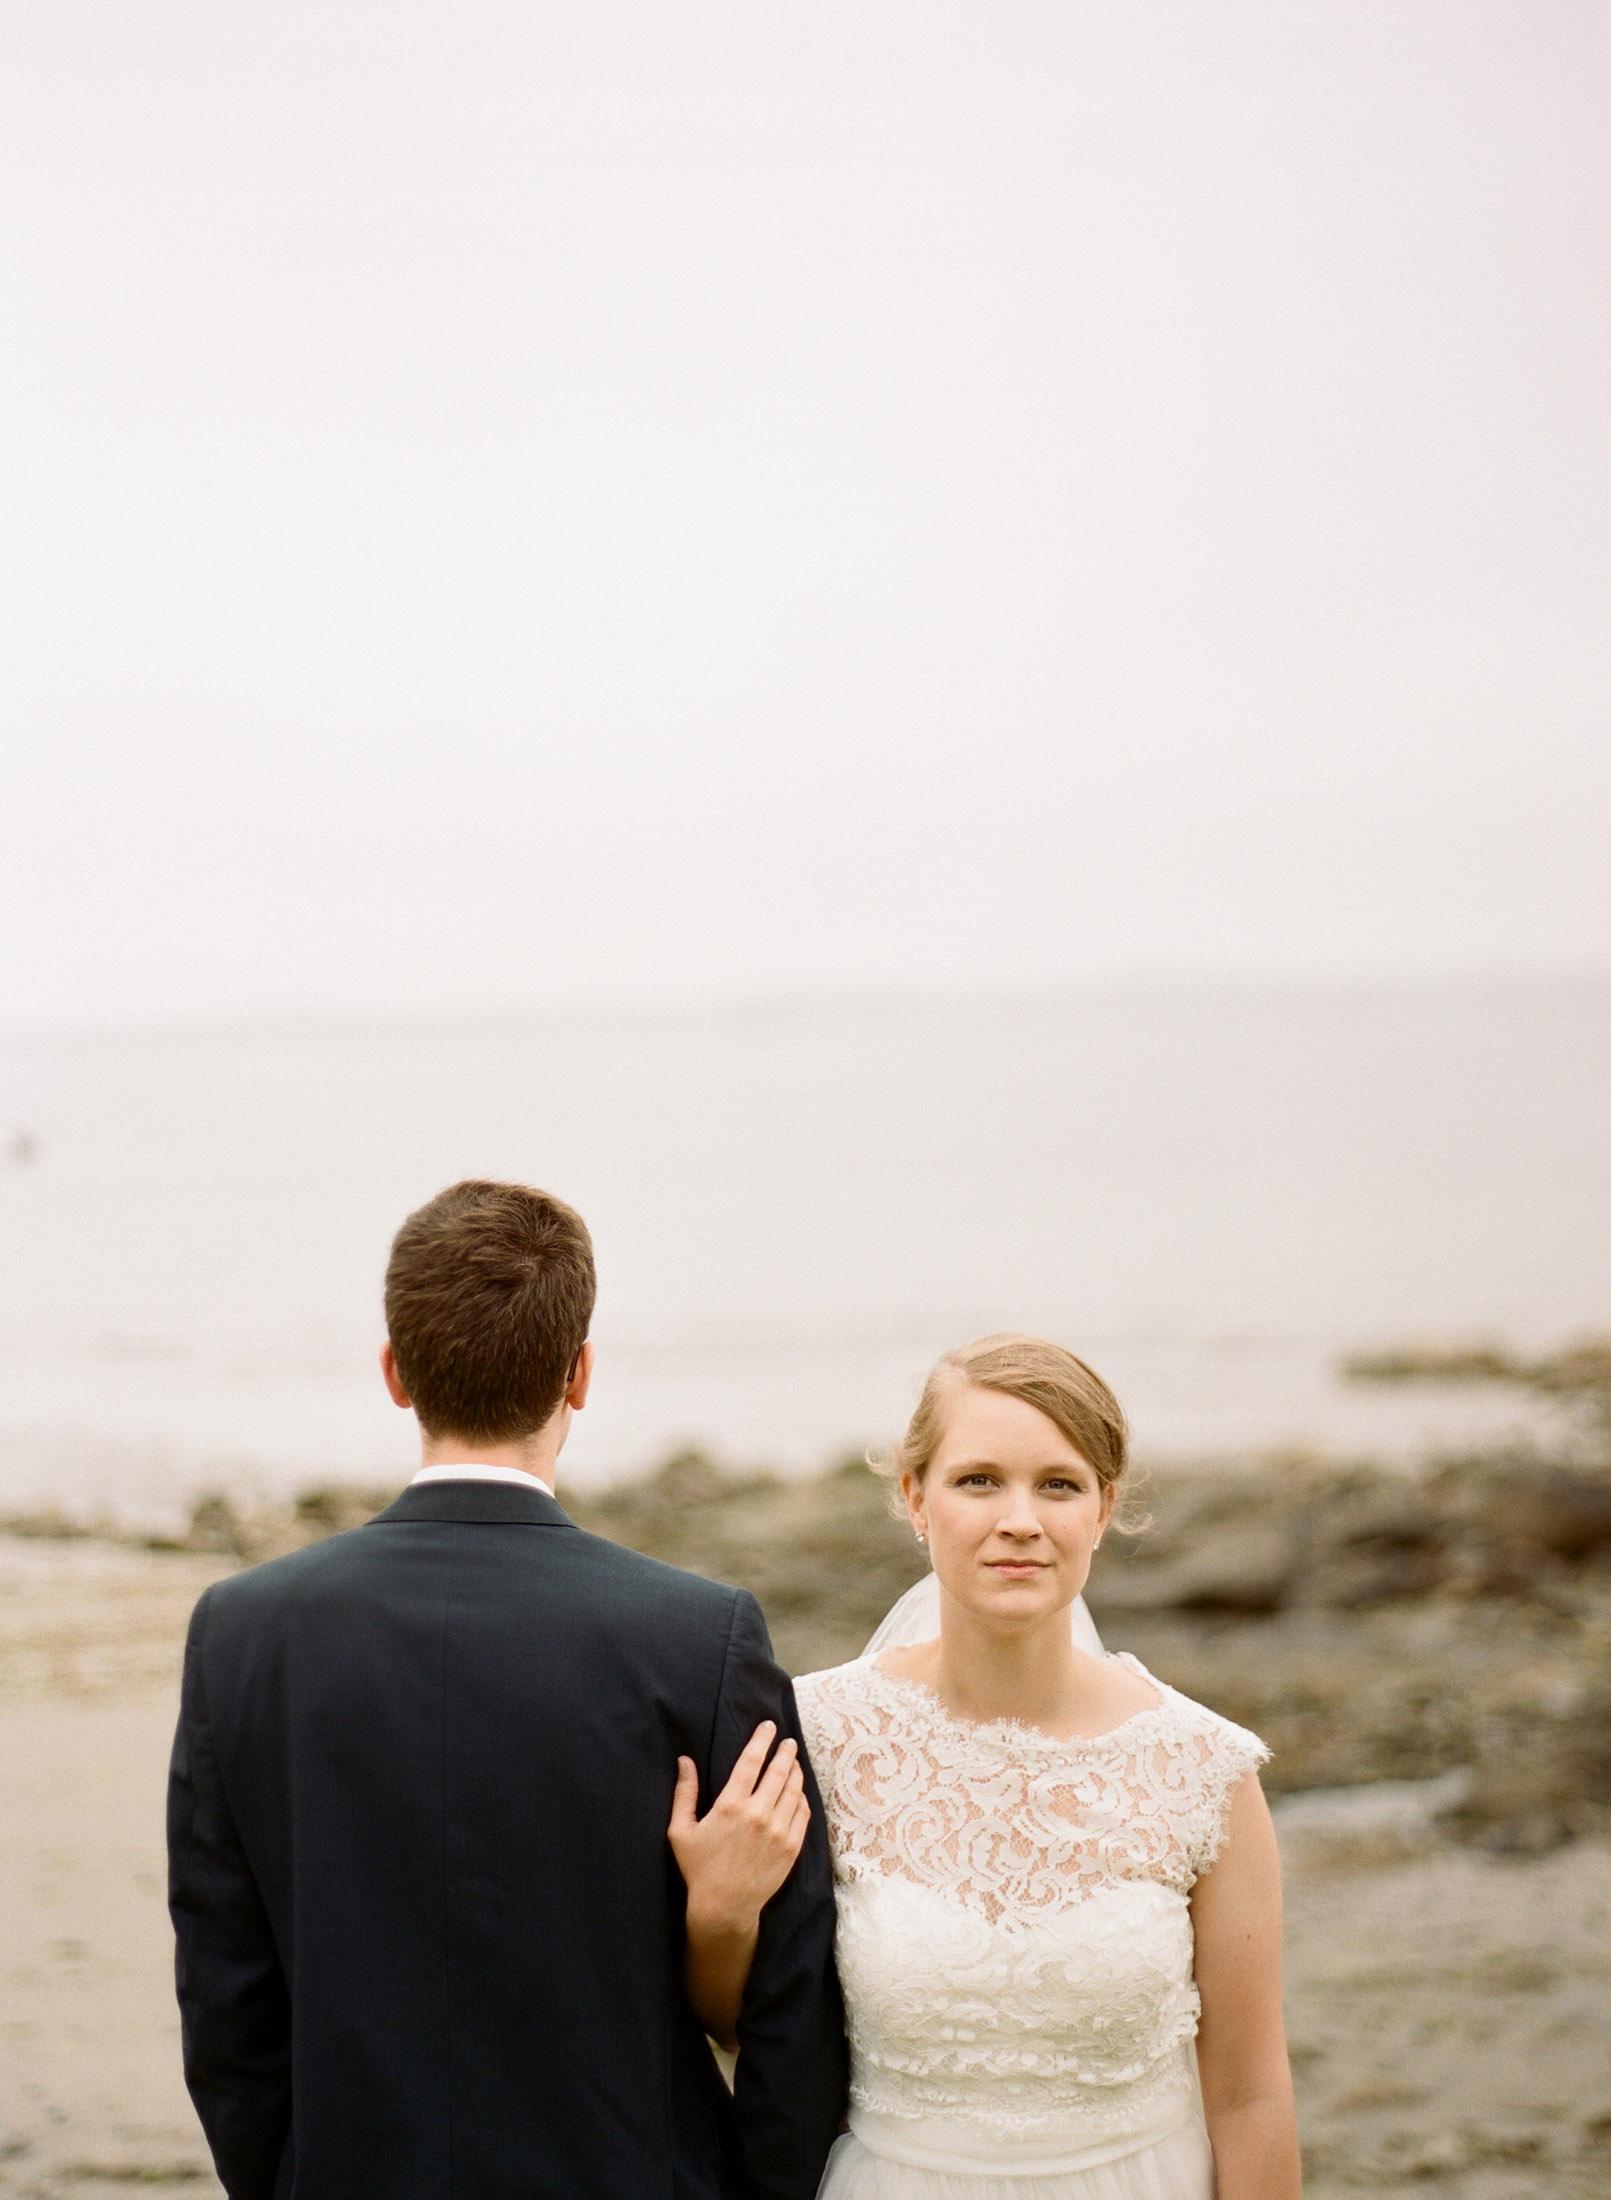 Elks-Wedding-Gloucester-48.jpg